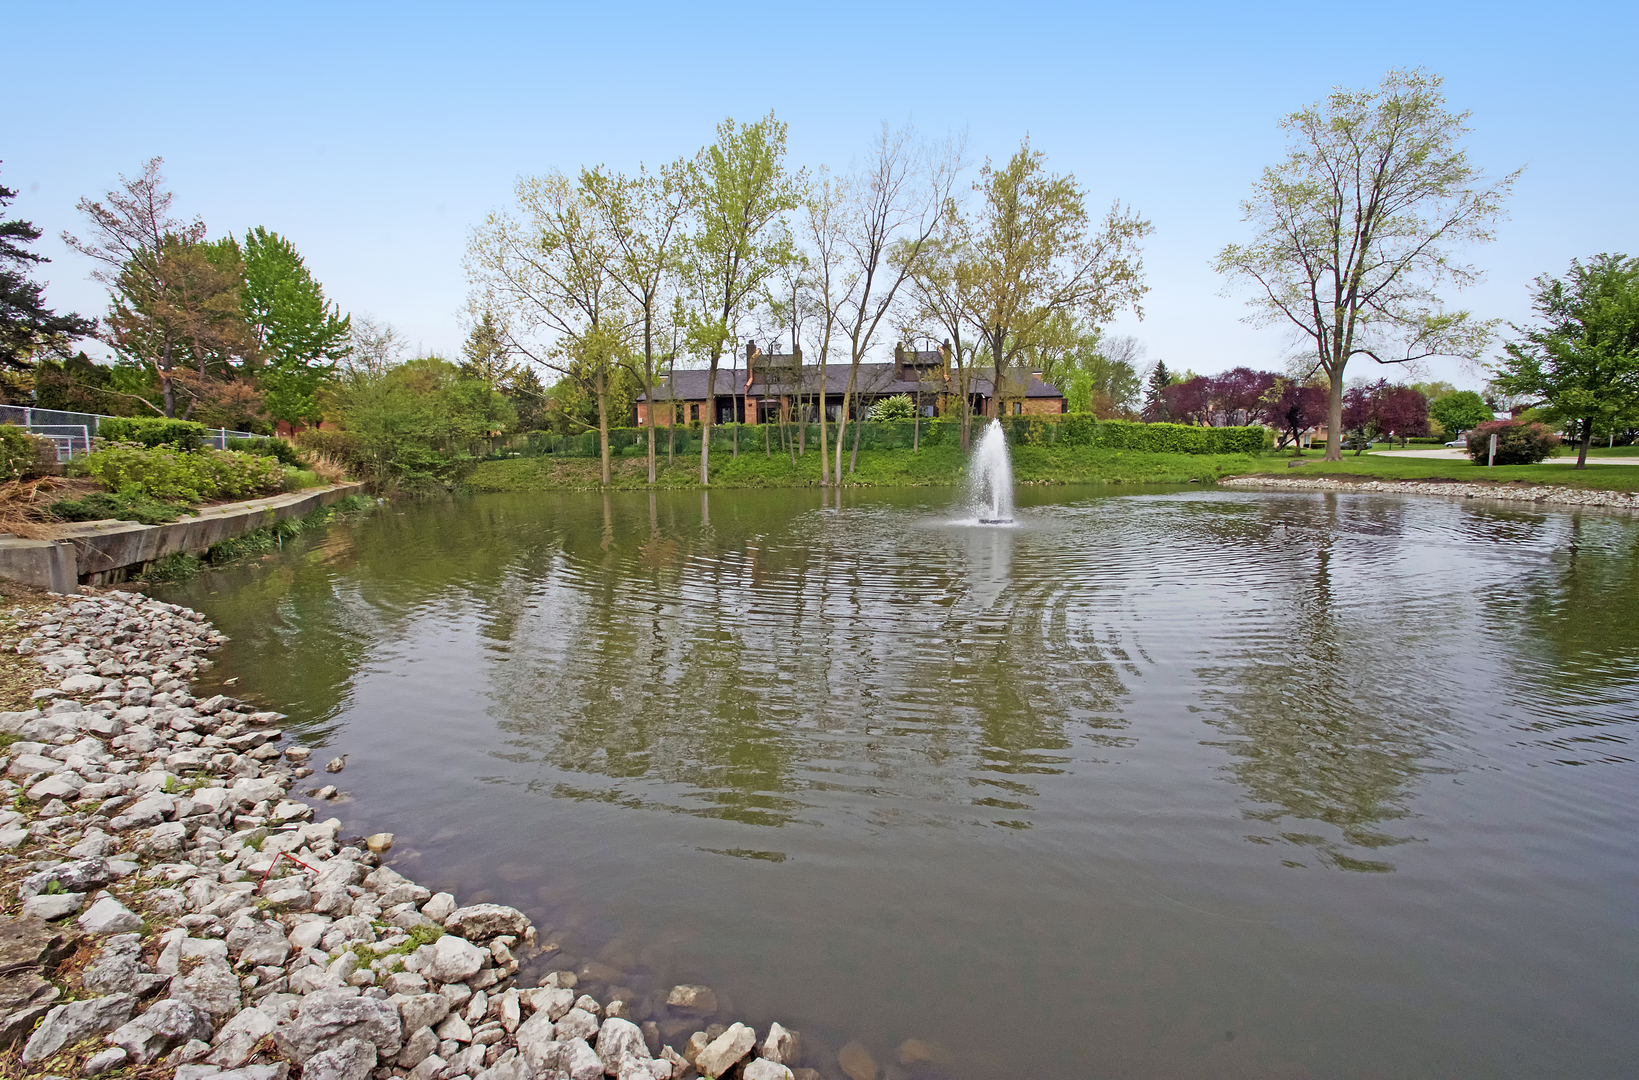 19W177 Theresa 177, Oak Brook, Illinois, 60523